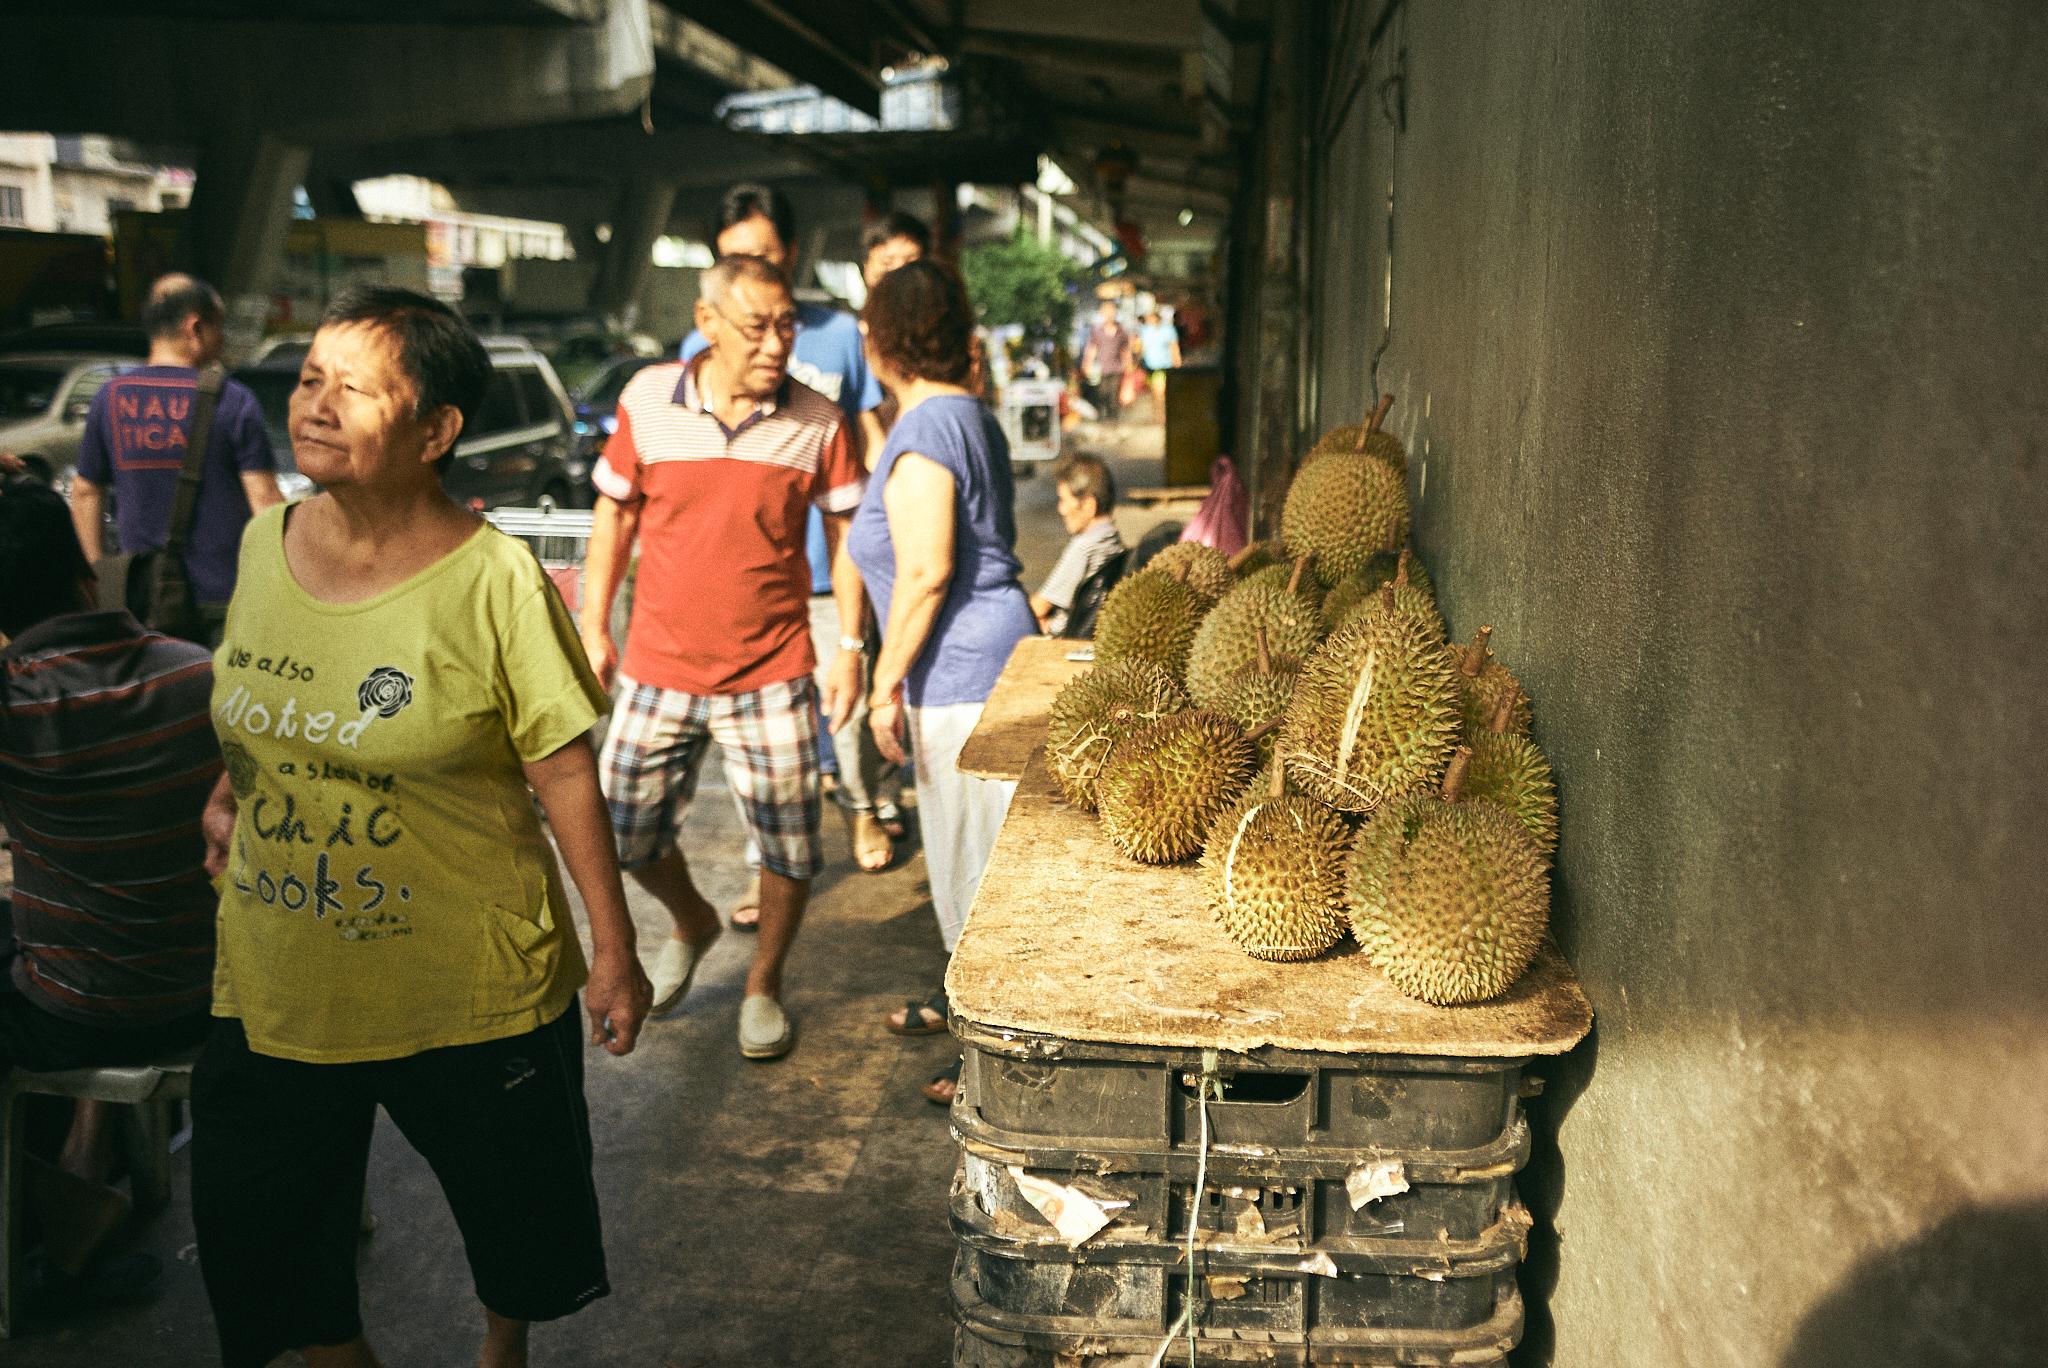 kuala lumpur street photography, king of the fruits